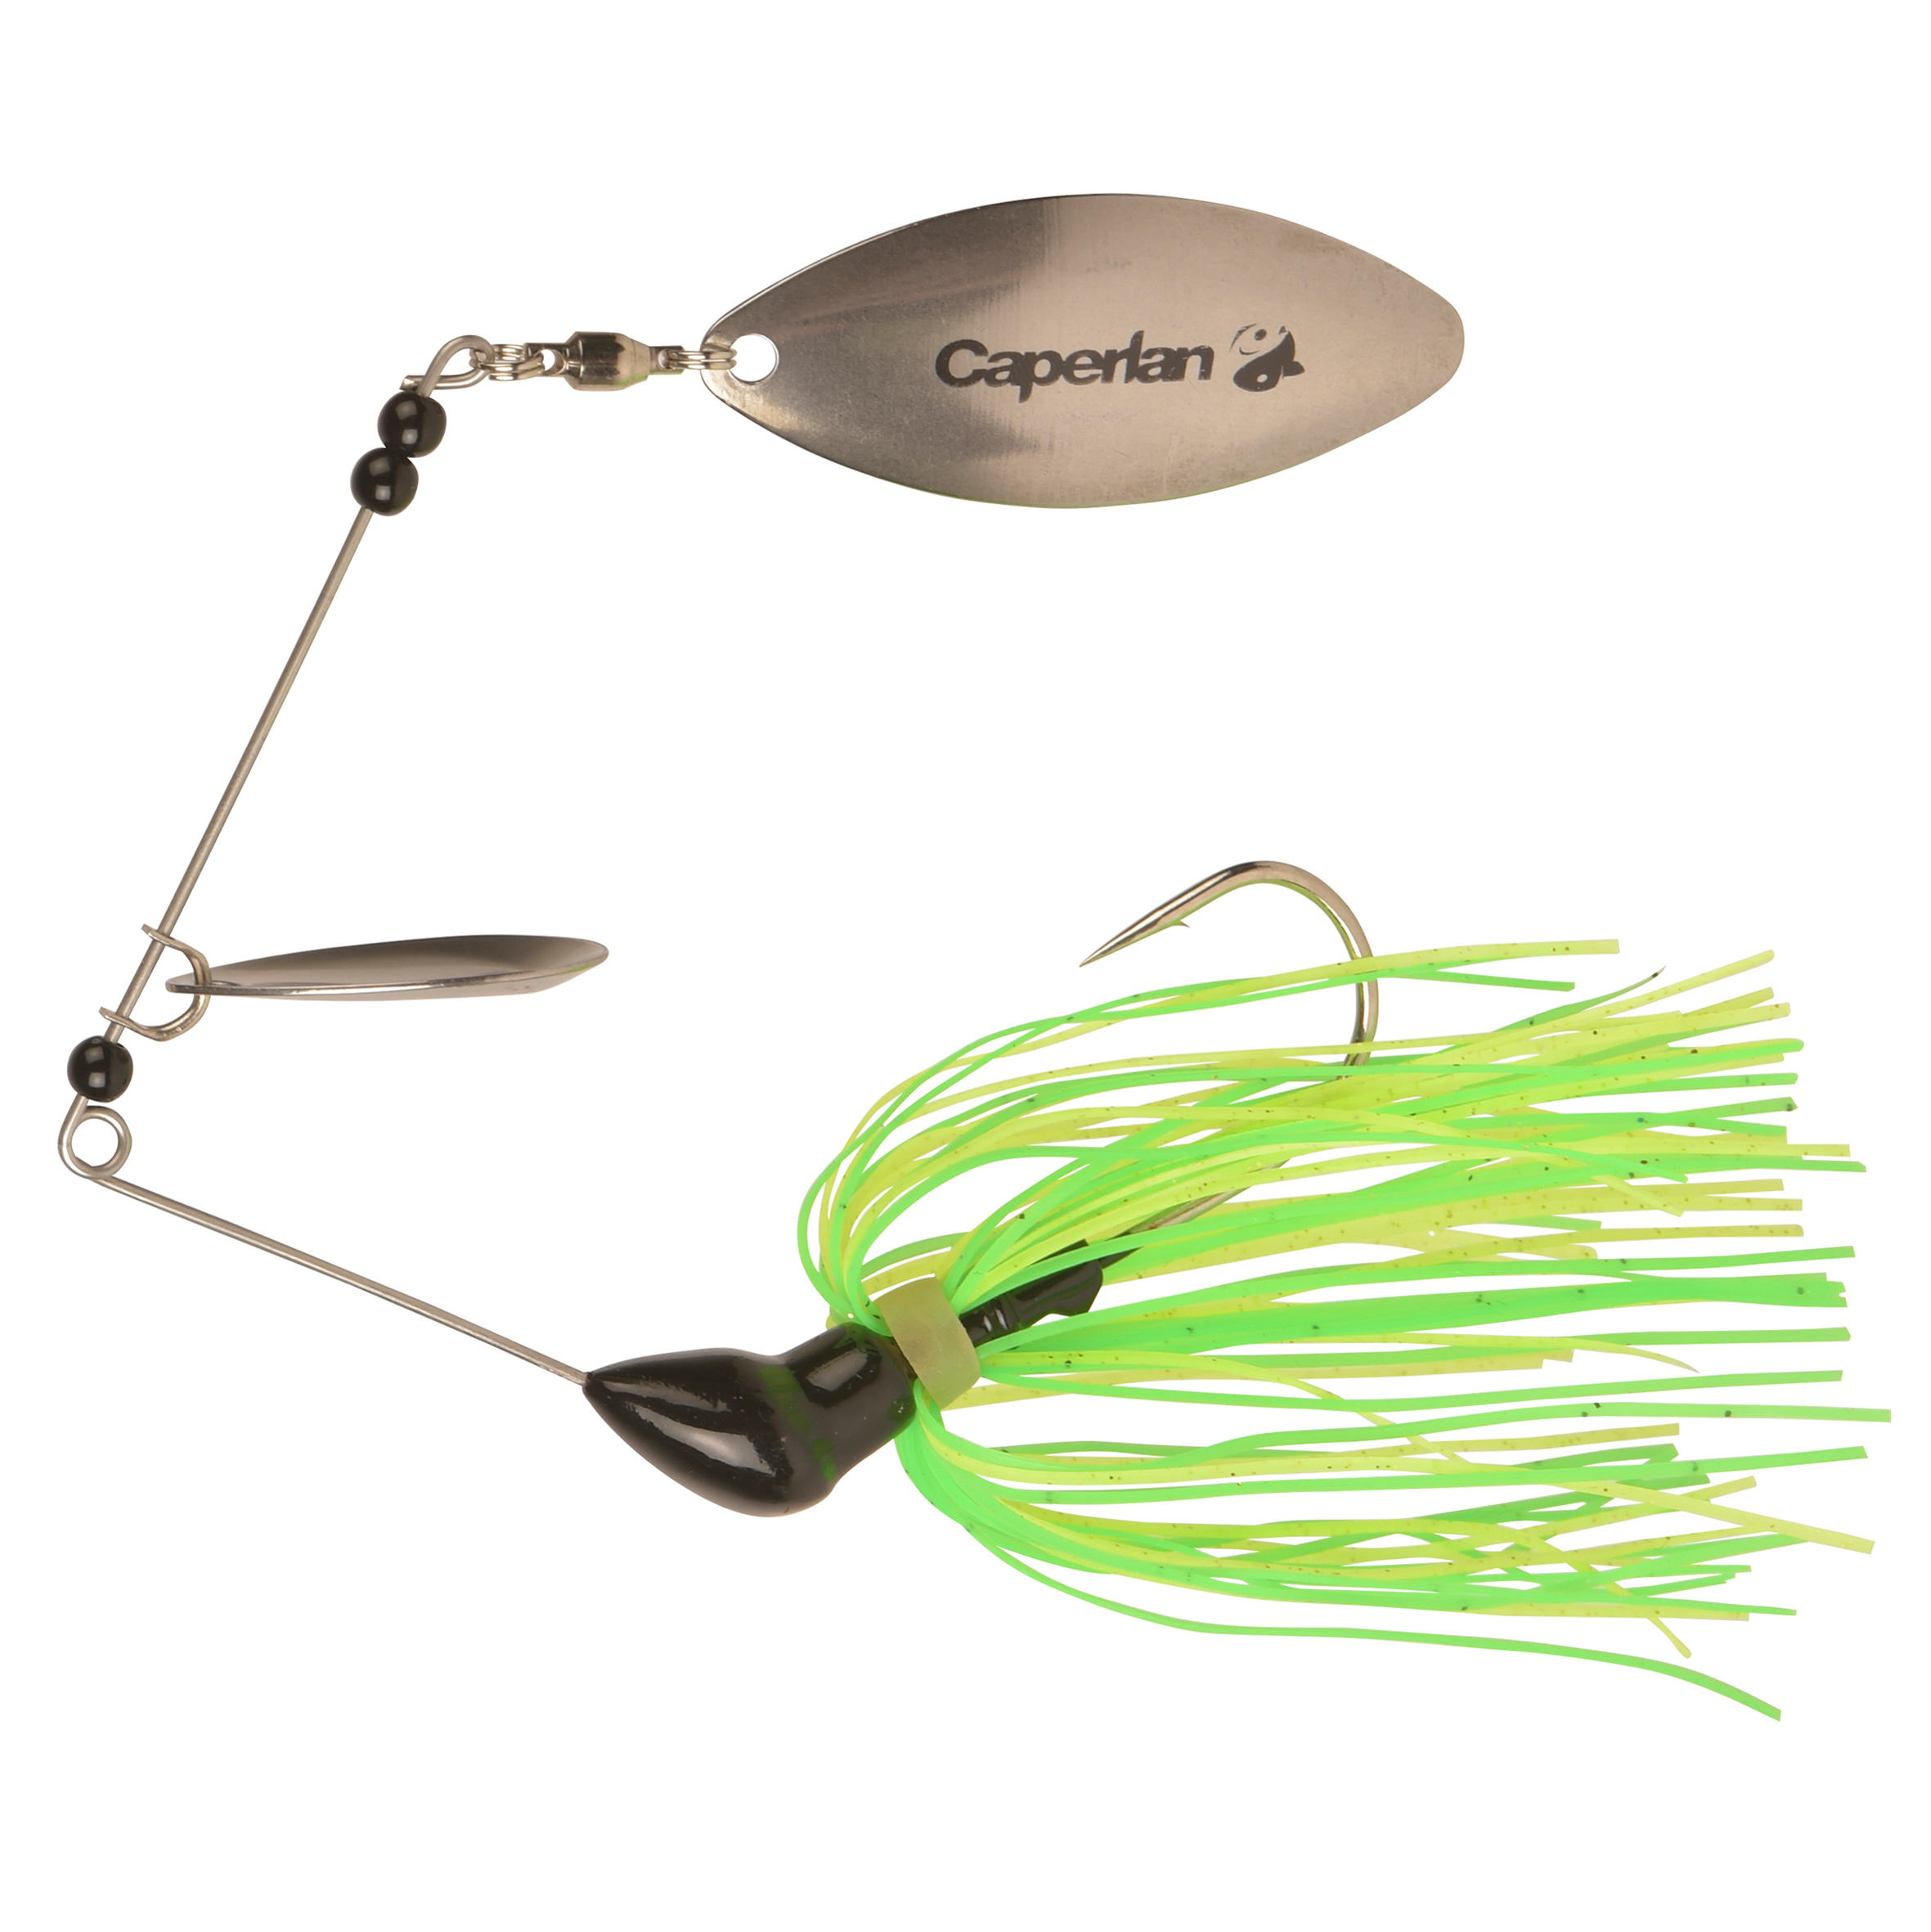 Buckhan 3/8oz Yellow/Green Lure Fishing Spinnerbait